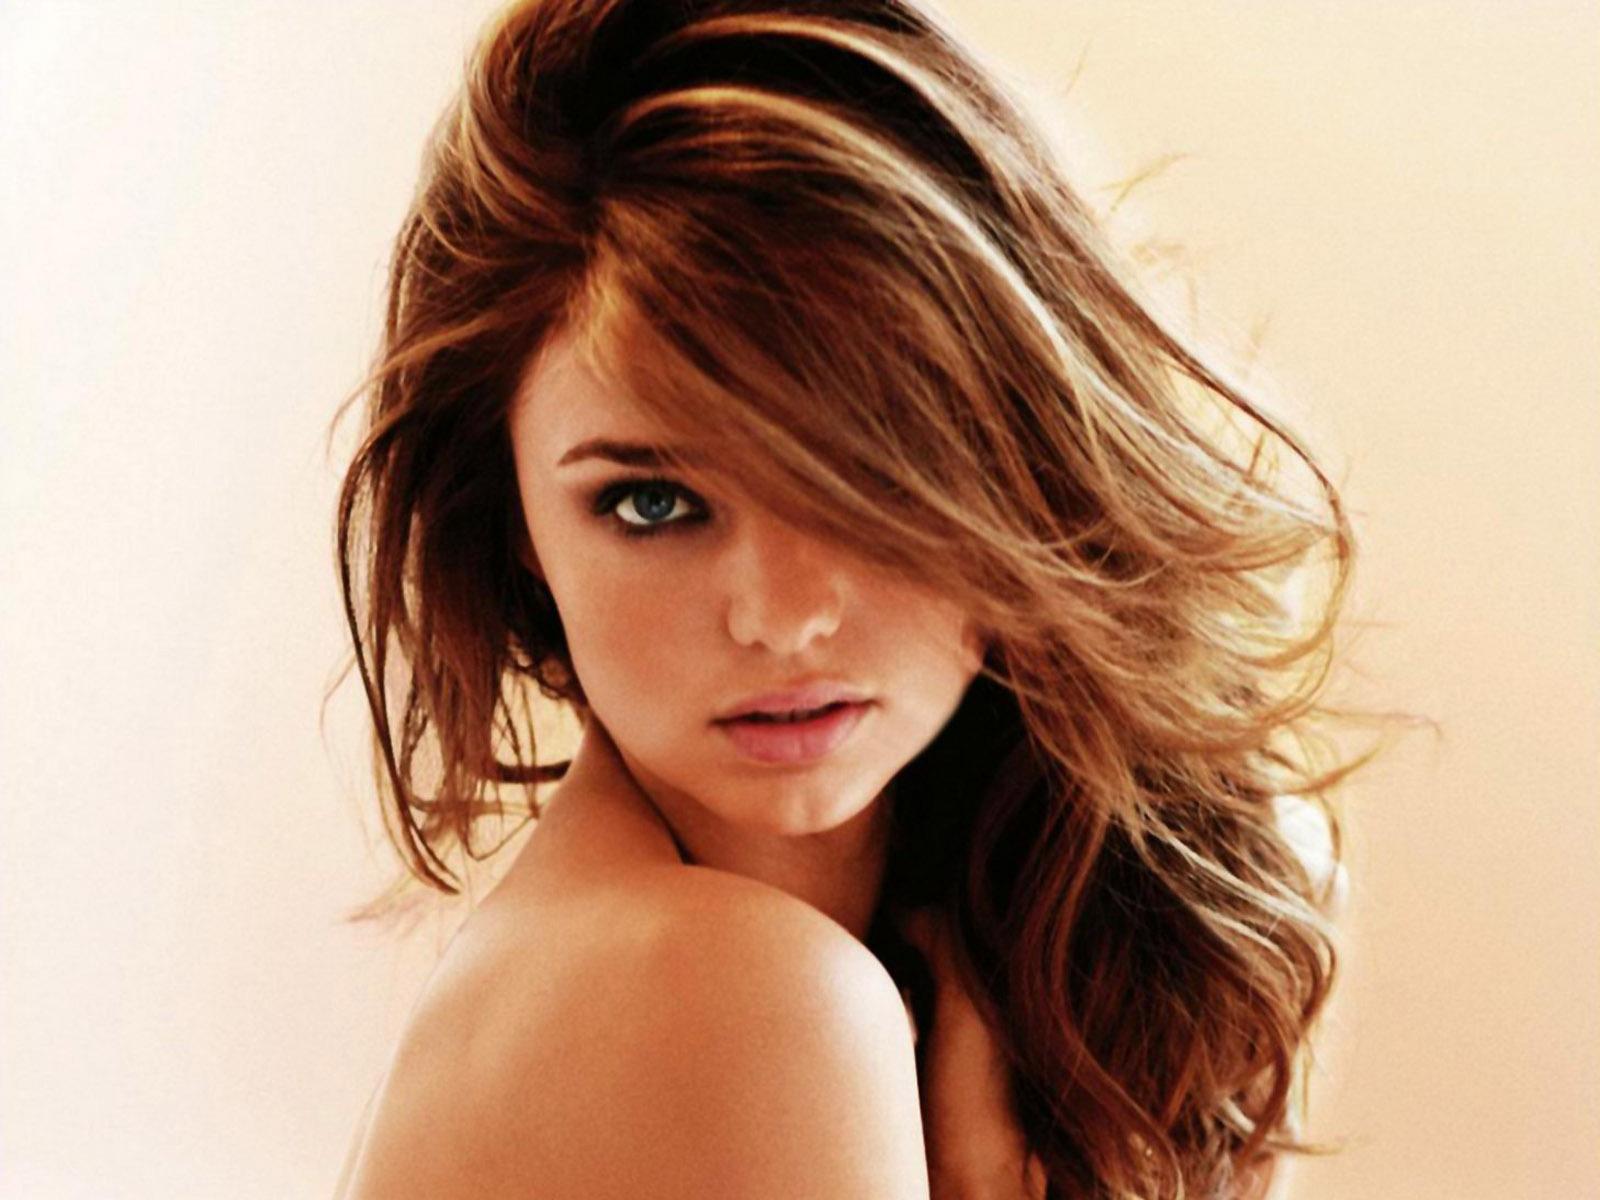 Miranda Kerr Pictures: Miranda Kerr Hairstyles миранда керр